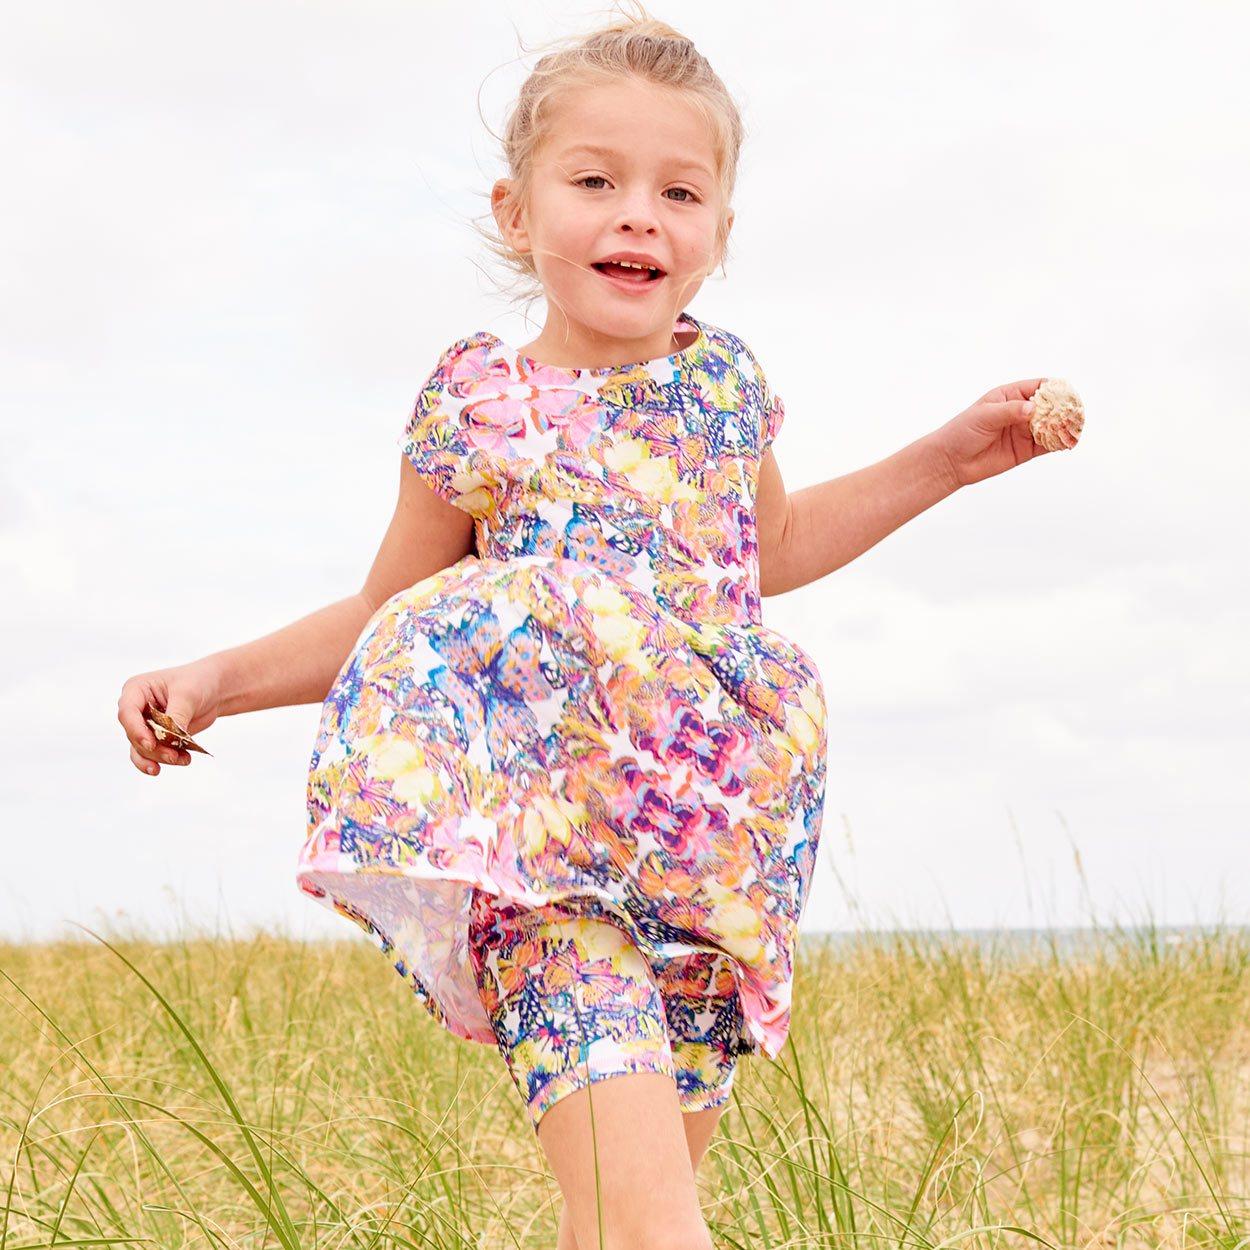 Butterflies Hybrid Shorts Upf50 Girls Size 2 12 Multicolor Opaline World Girl Running On The Beach On A Windy Day Sunpoplife